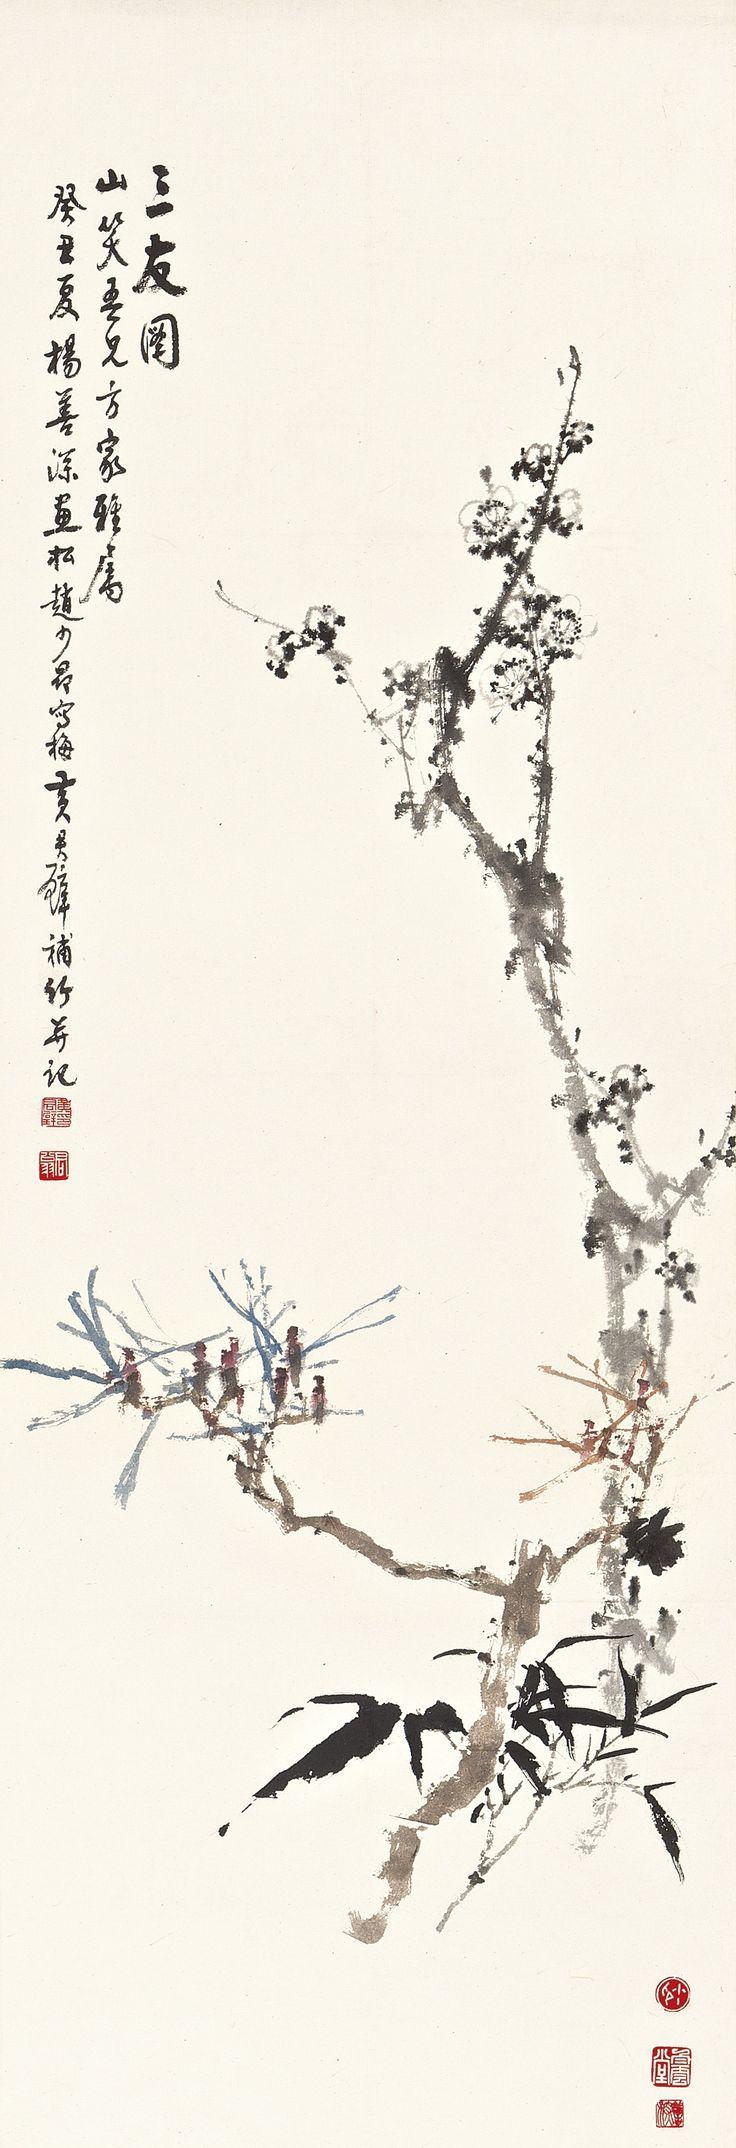 zhao; yang; huang pine, ||| flowers & plants ||| sotheby's hk0362lot65qjfen